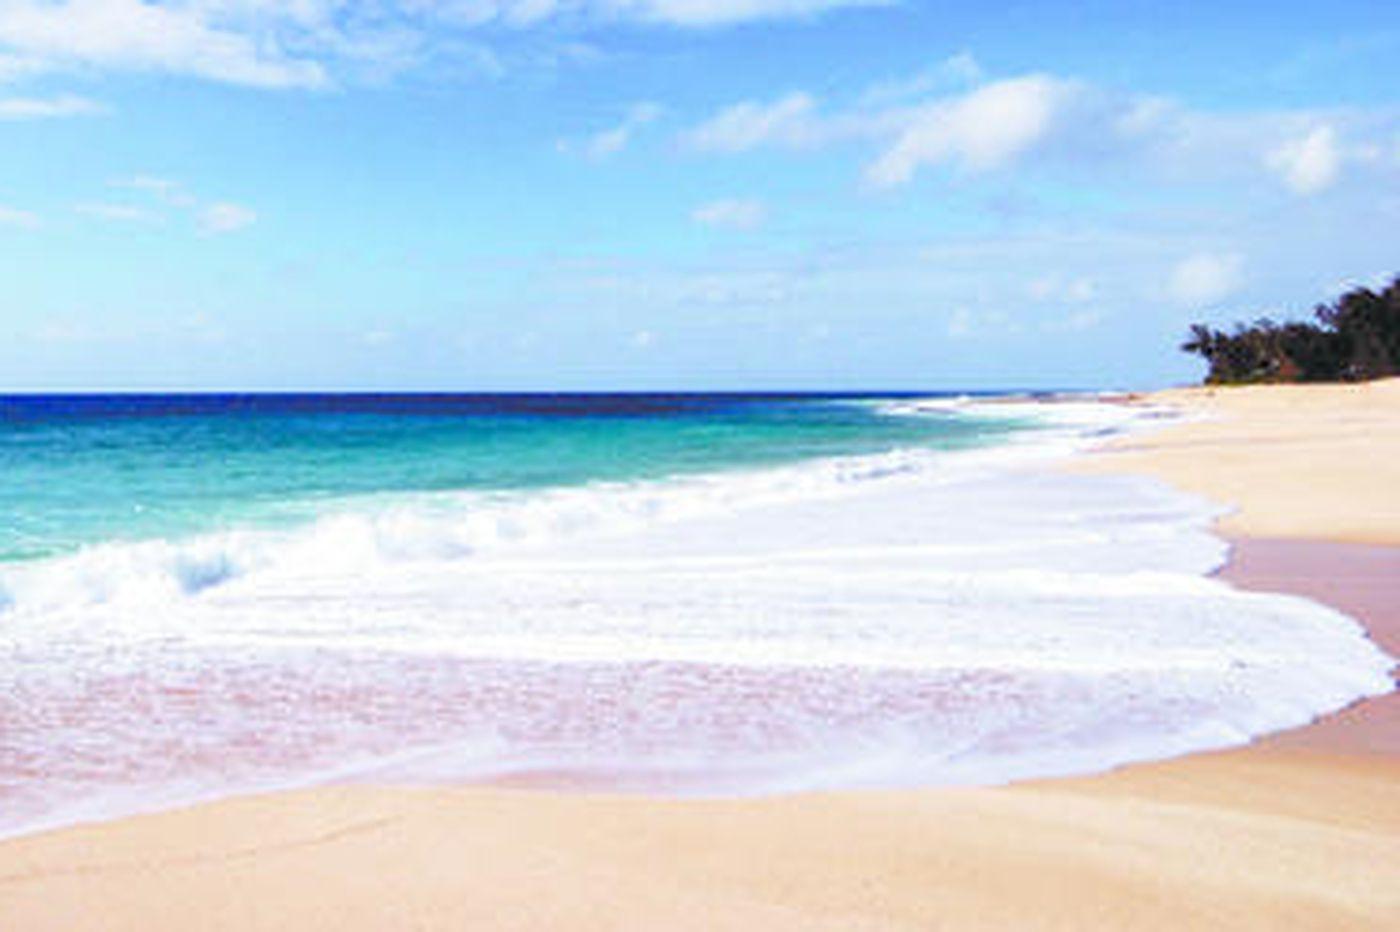 Online Traveler: Oahu's balmy beaches beckon